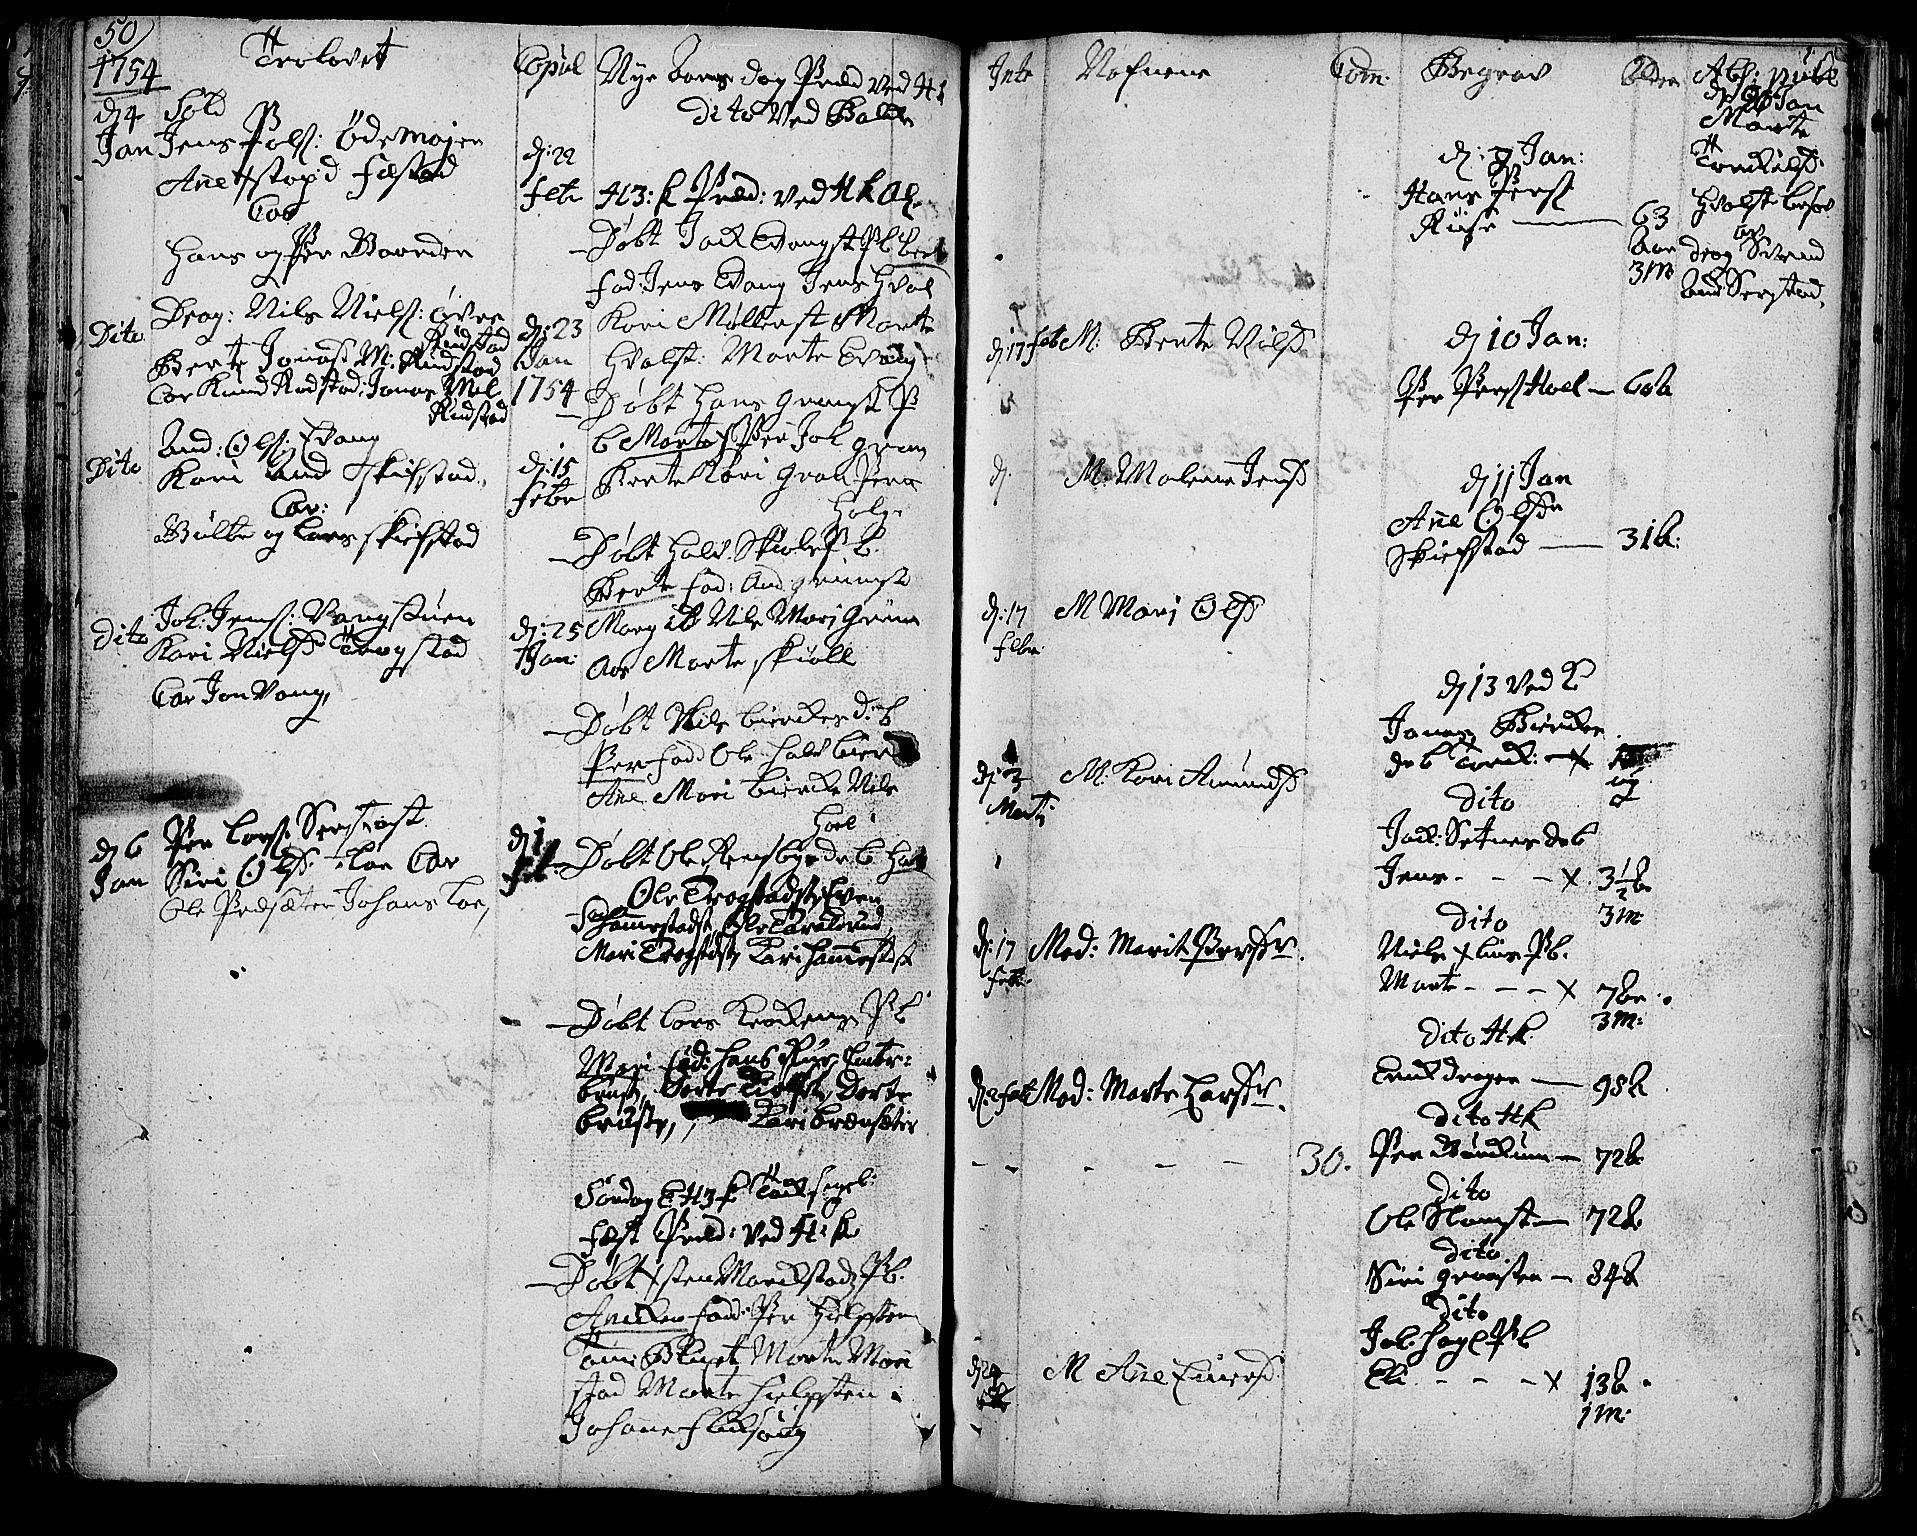 SAH, Toten prestekontor, Ministerialbok nr. 4, 1751-1761, s. 50